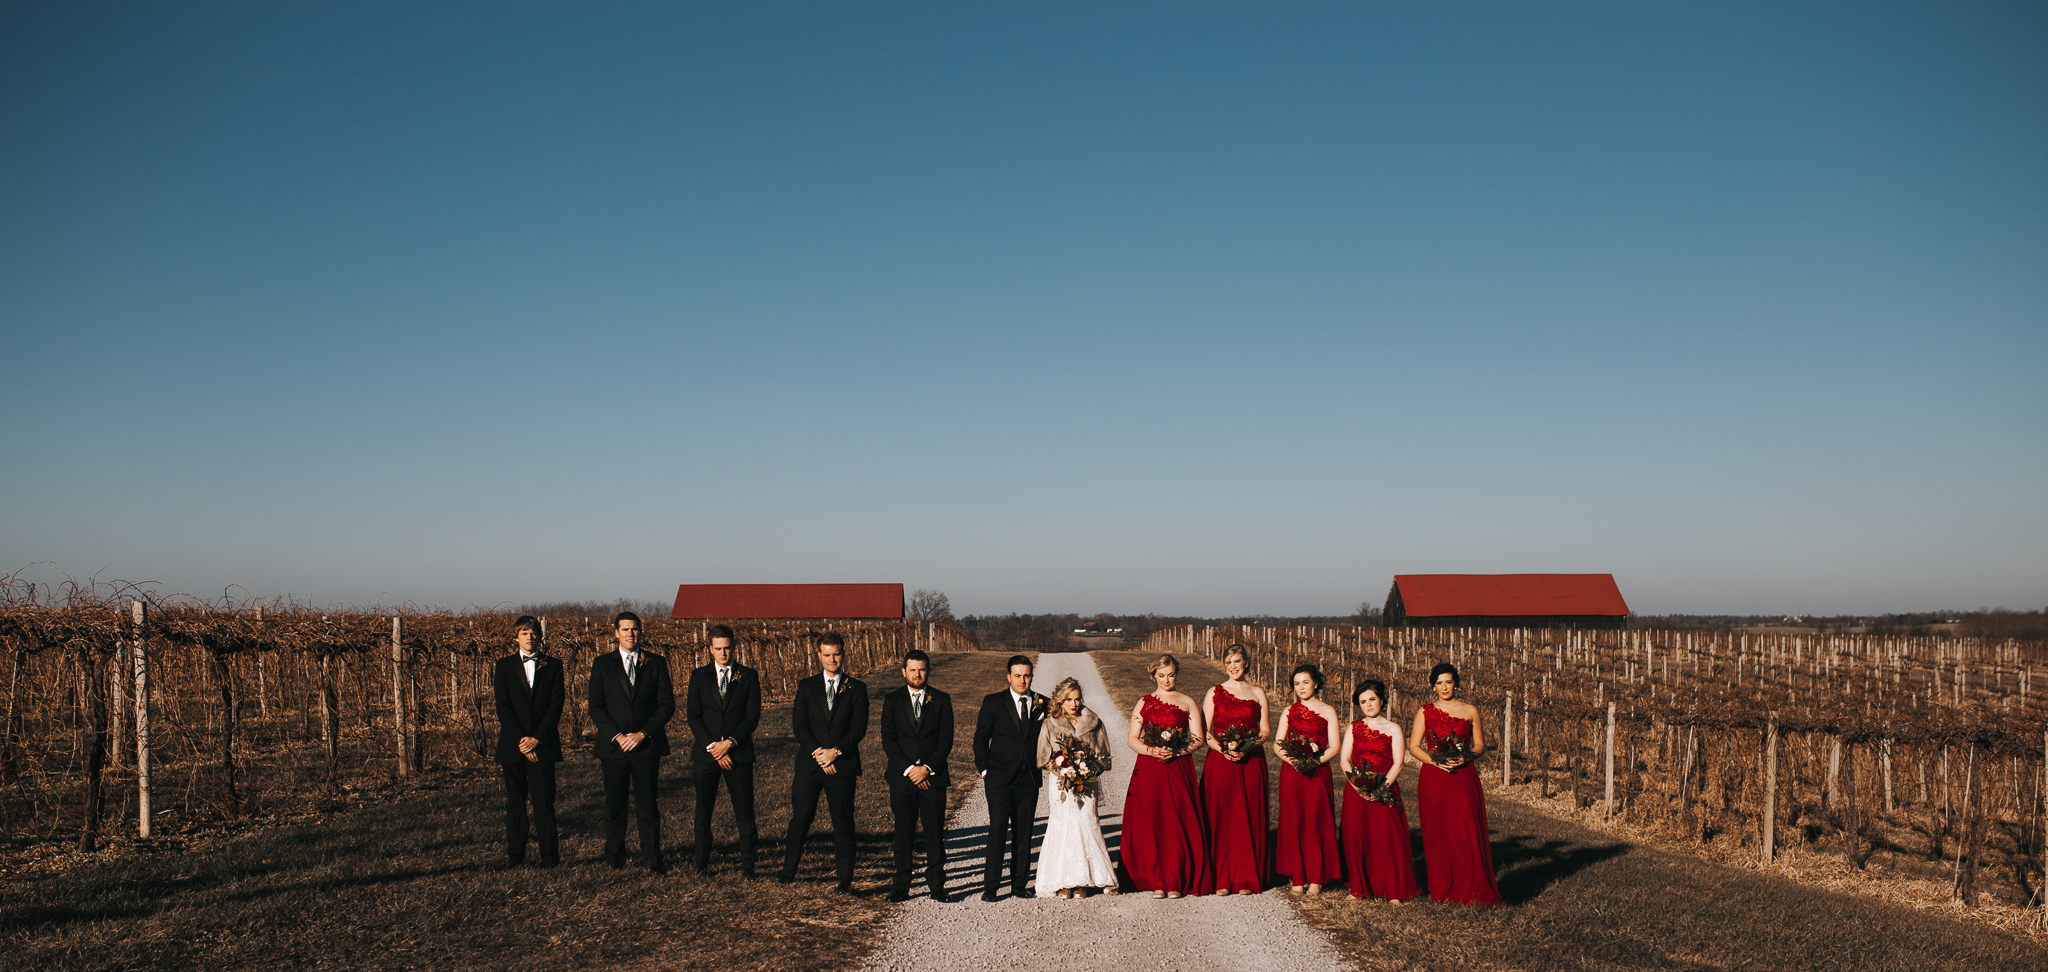 0086 Ariana Jordan Photo - Cameron & Lauren's Wedding at Talon Winery  6348.jpg